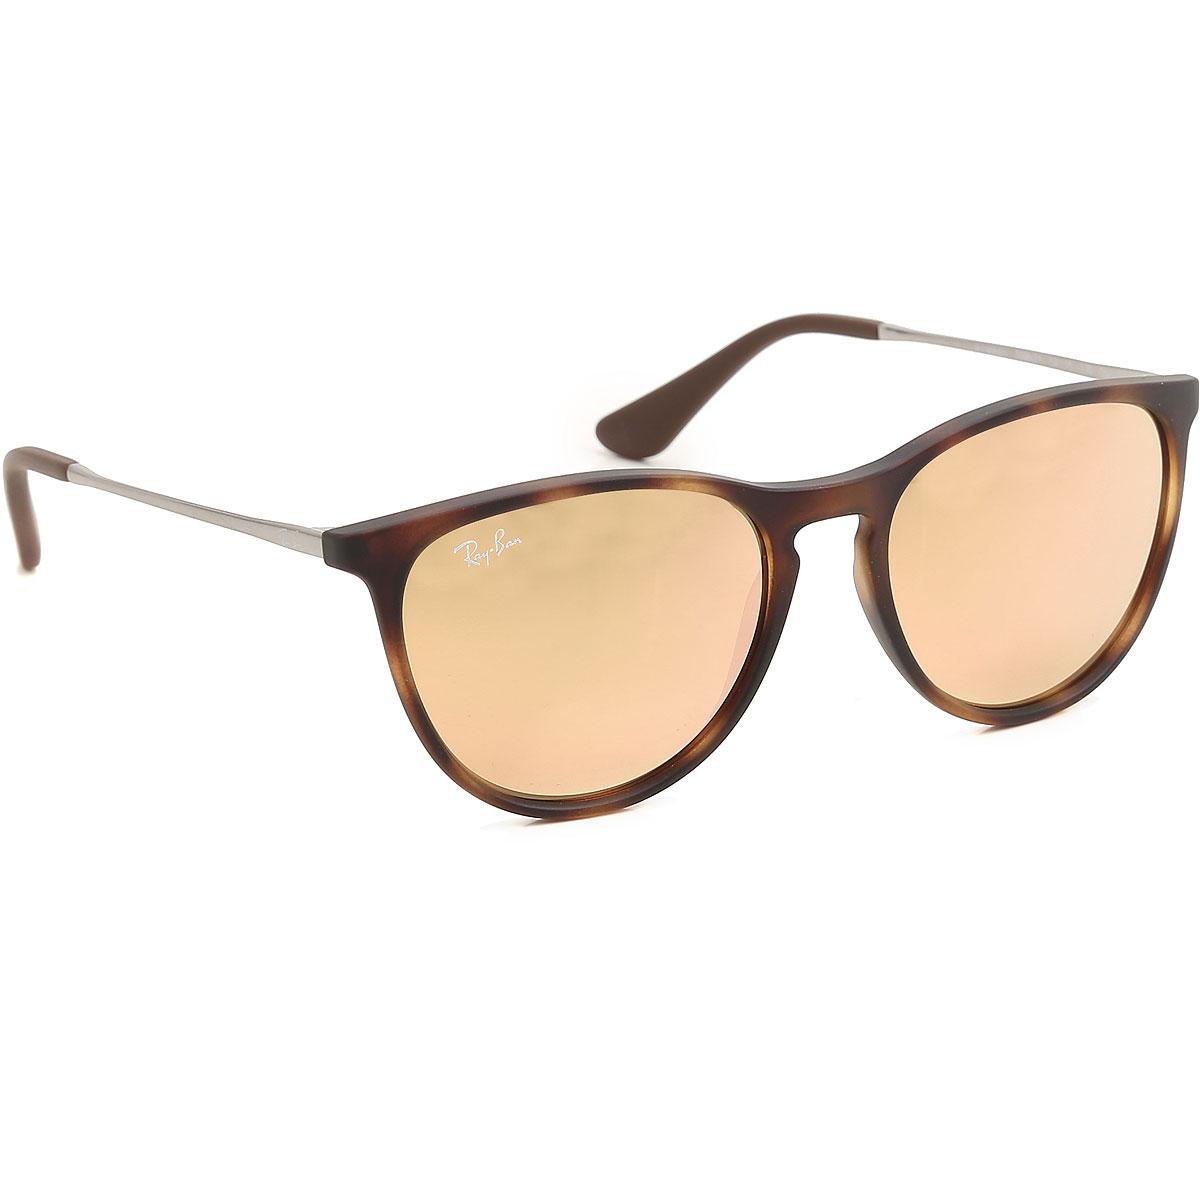 Image of Ray Ban Junior Kids Sunglasses for Girls On Sale, Matt Havana, 2017